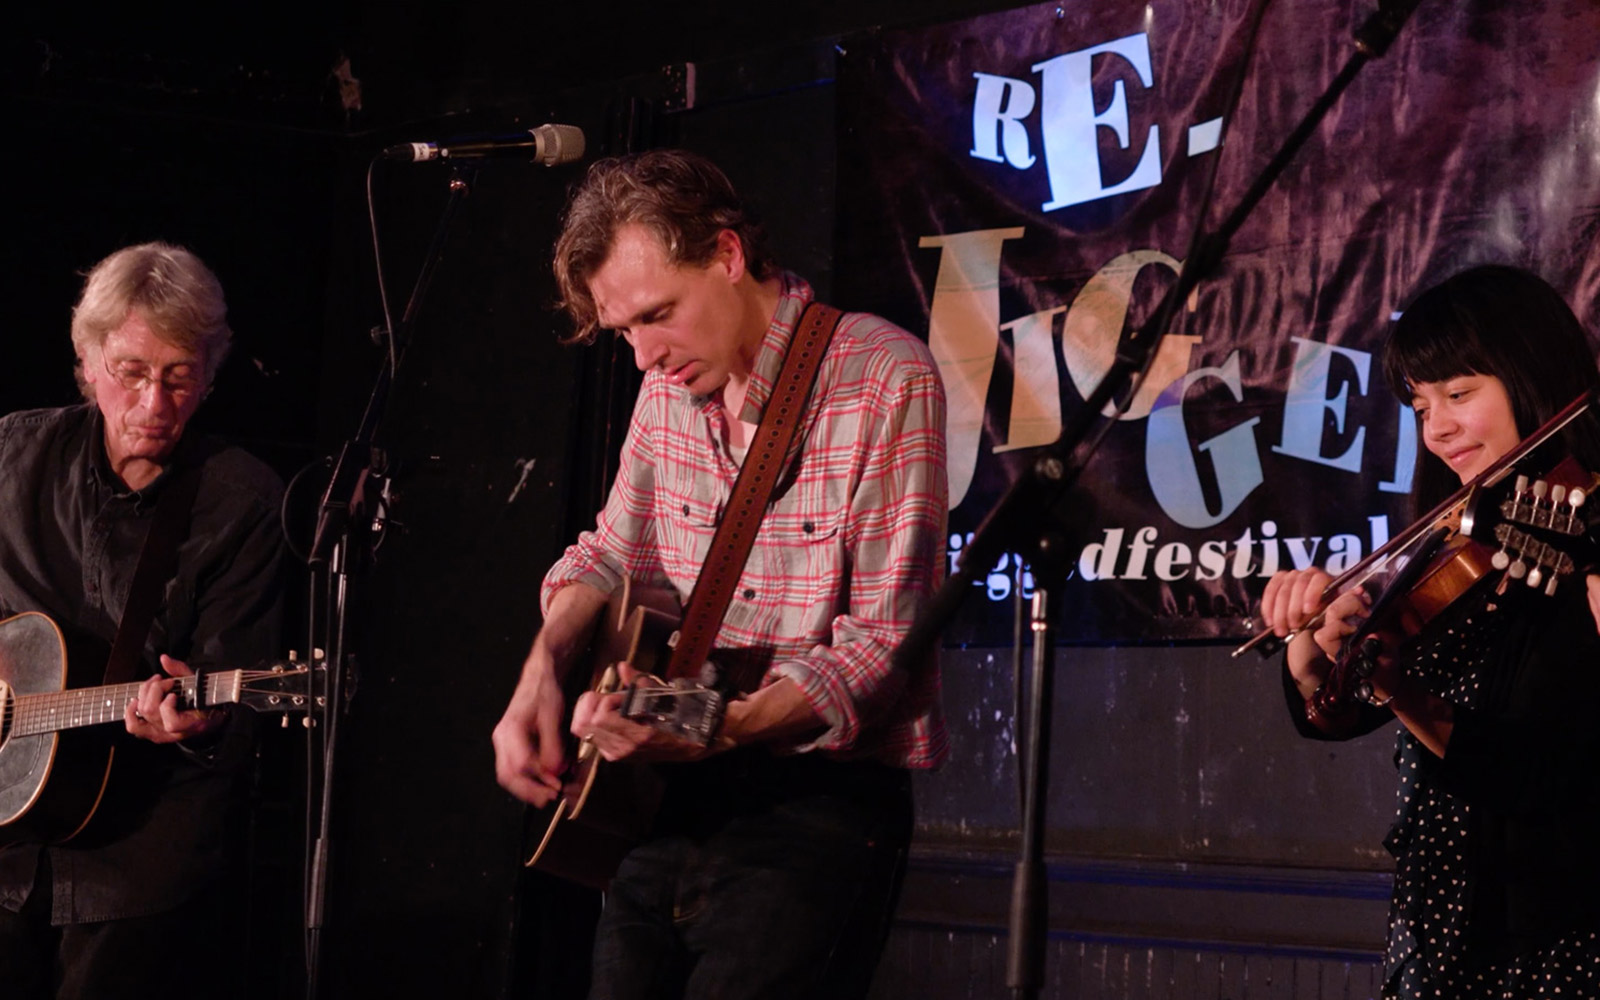 Still from ReJigged festival with Joel Plasket on stage